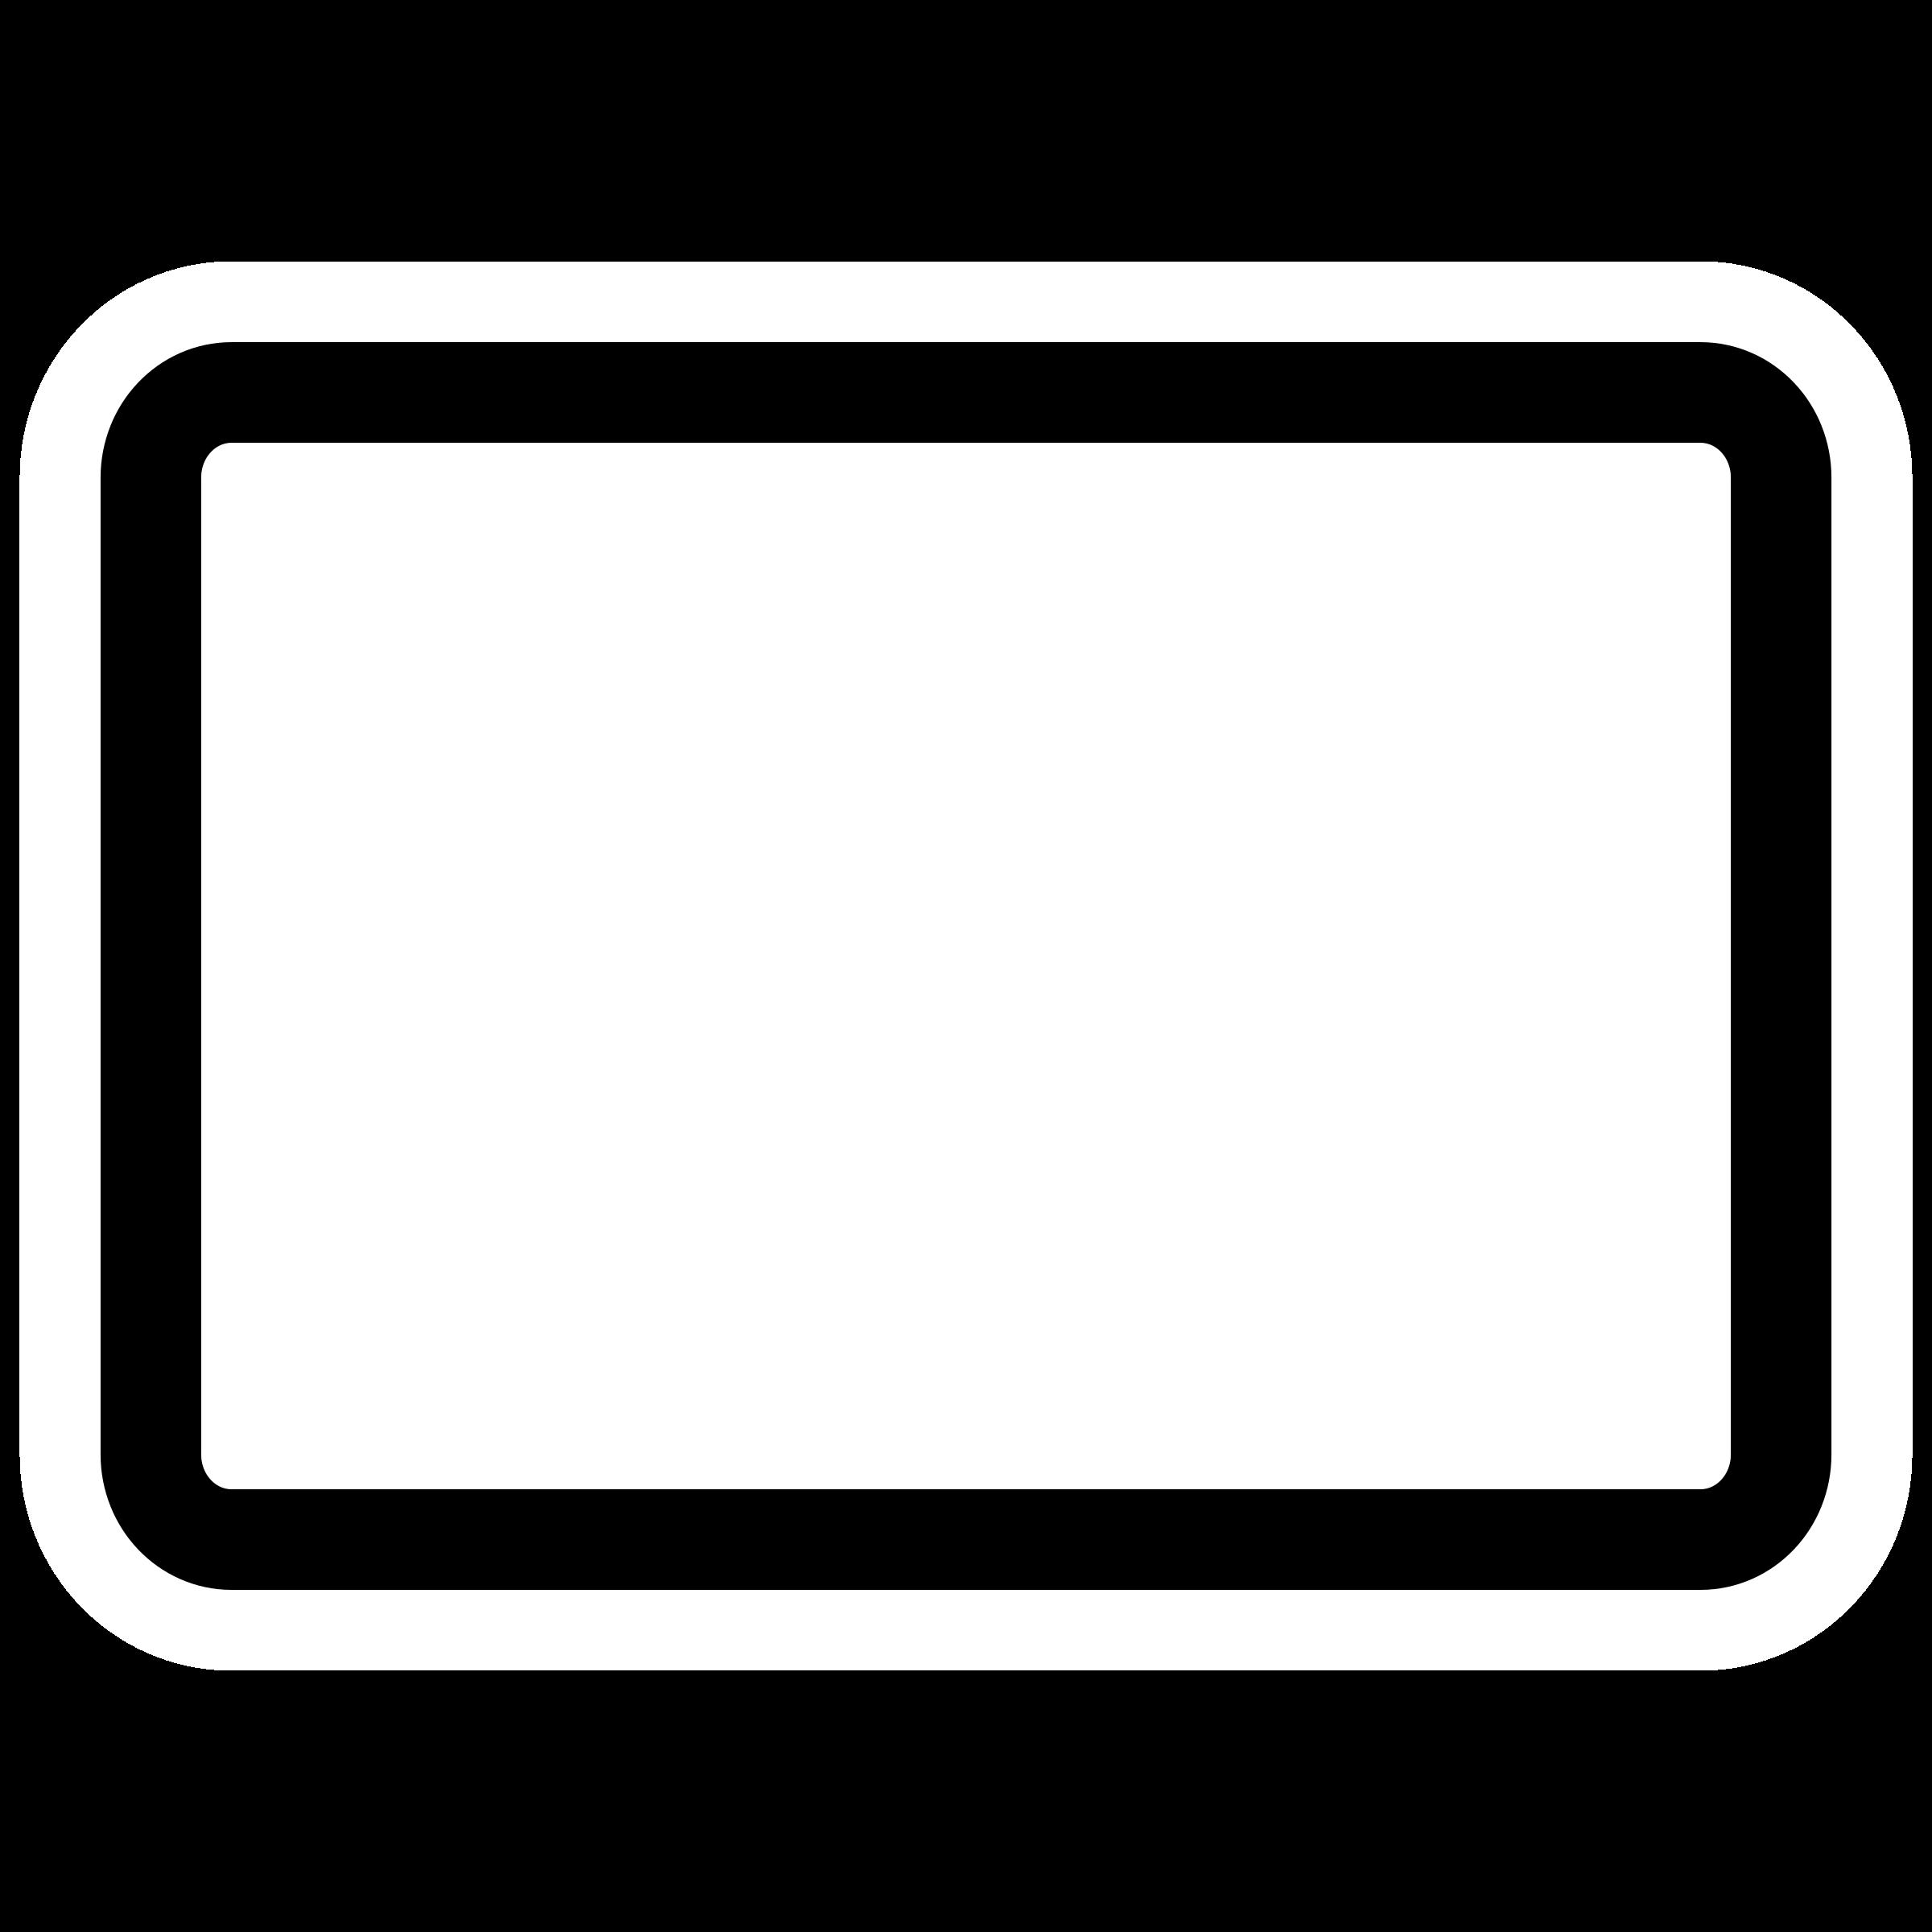 Clipart Mono Frame